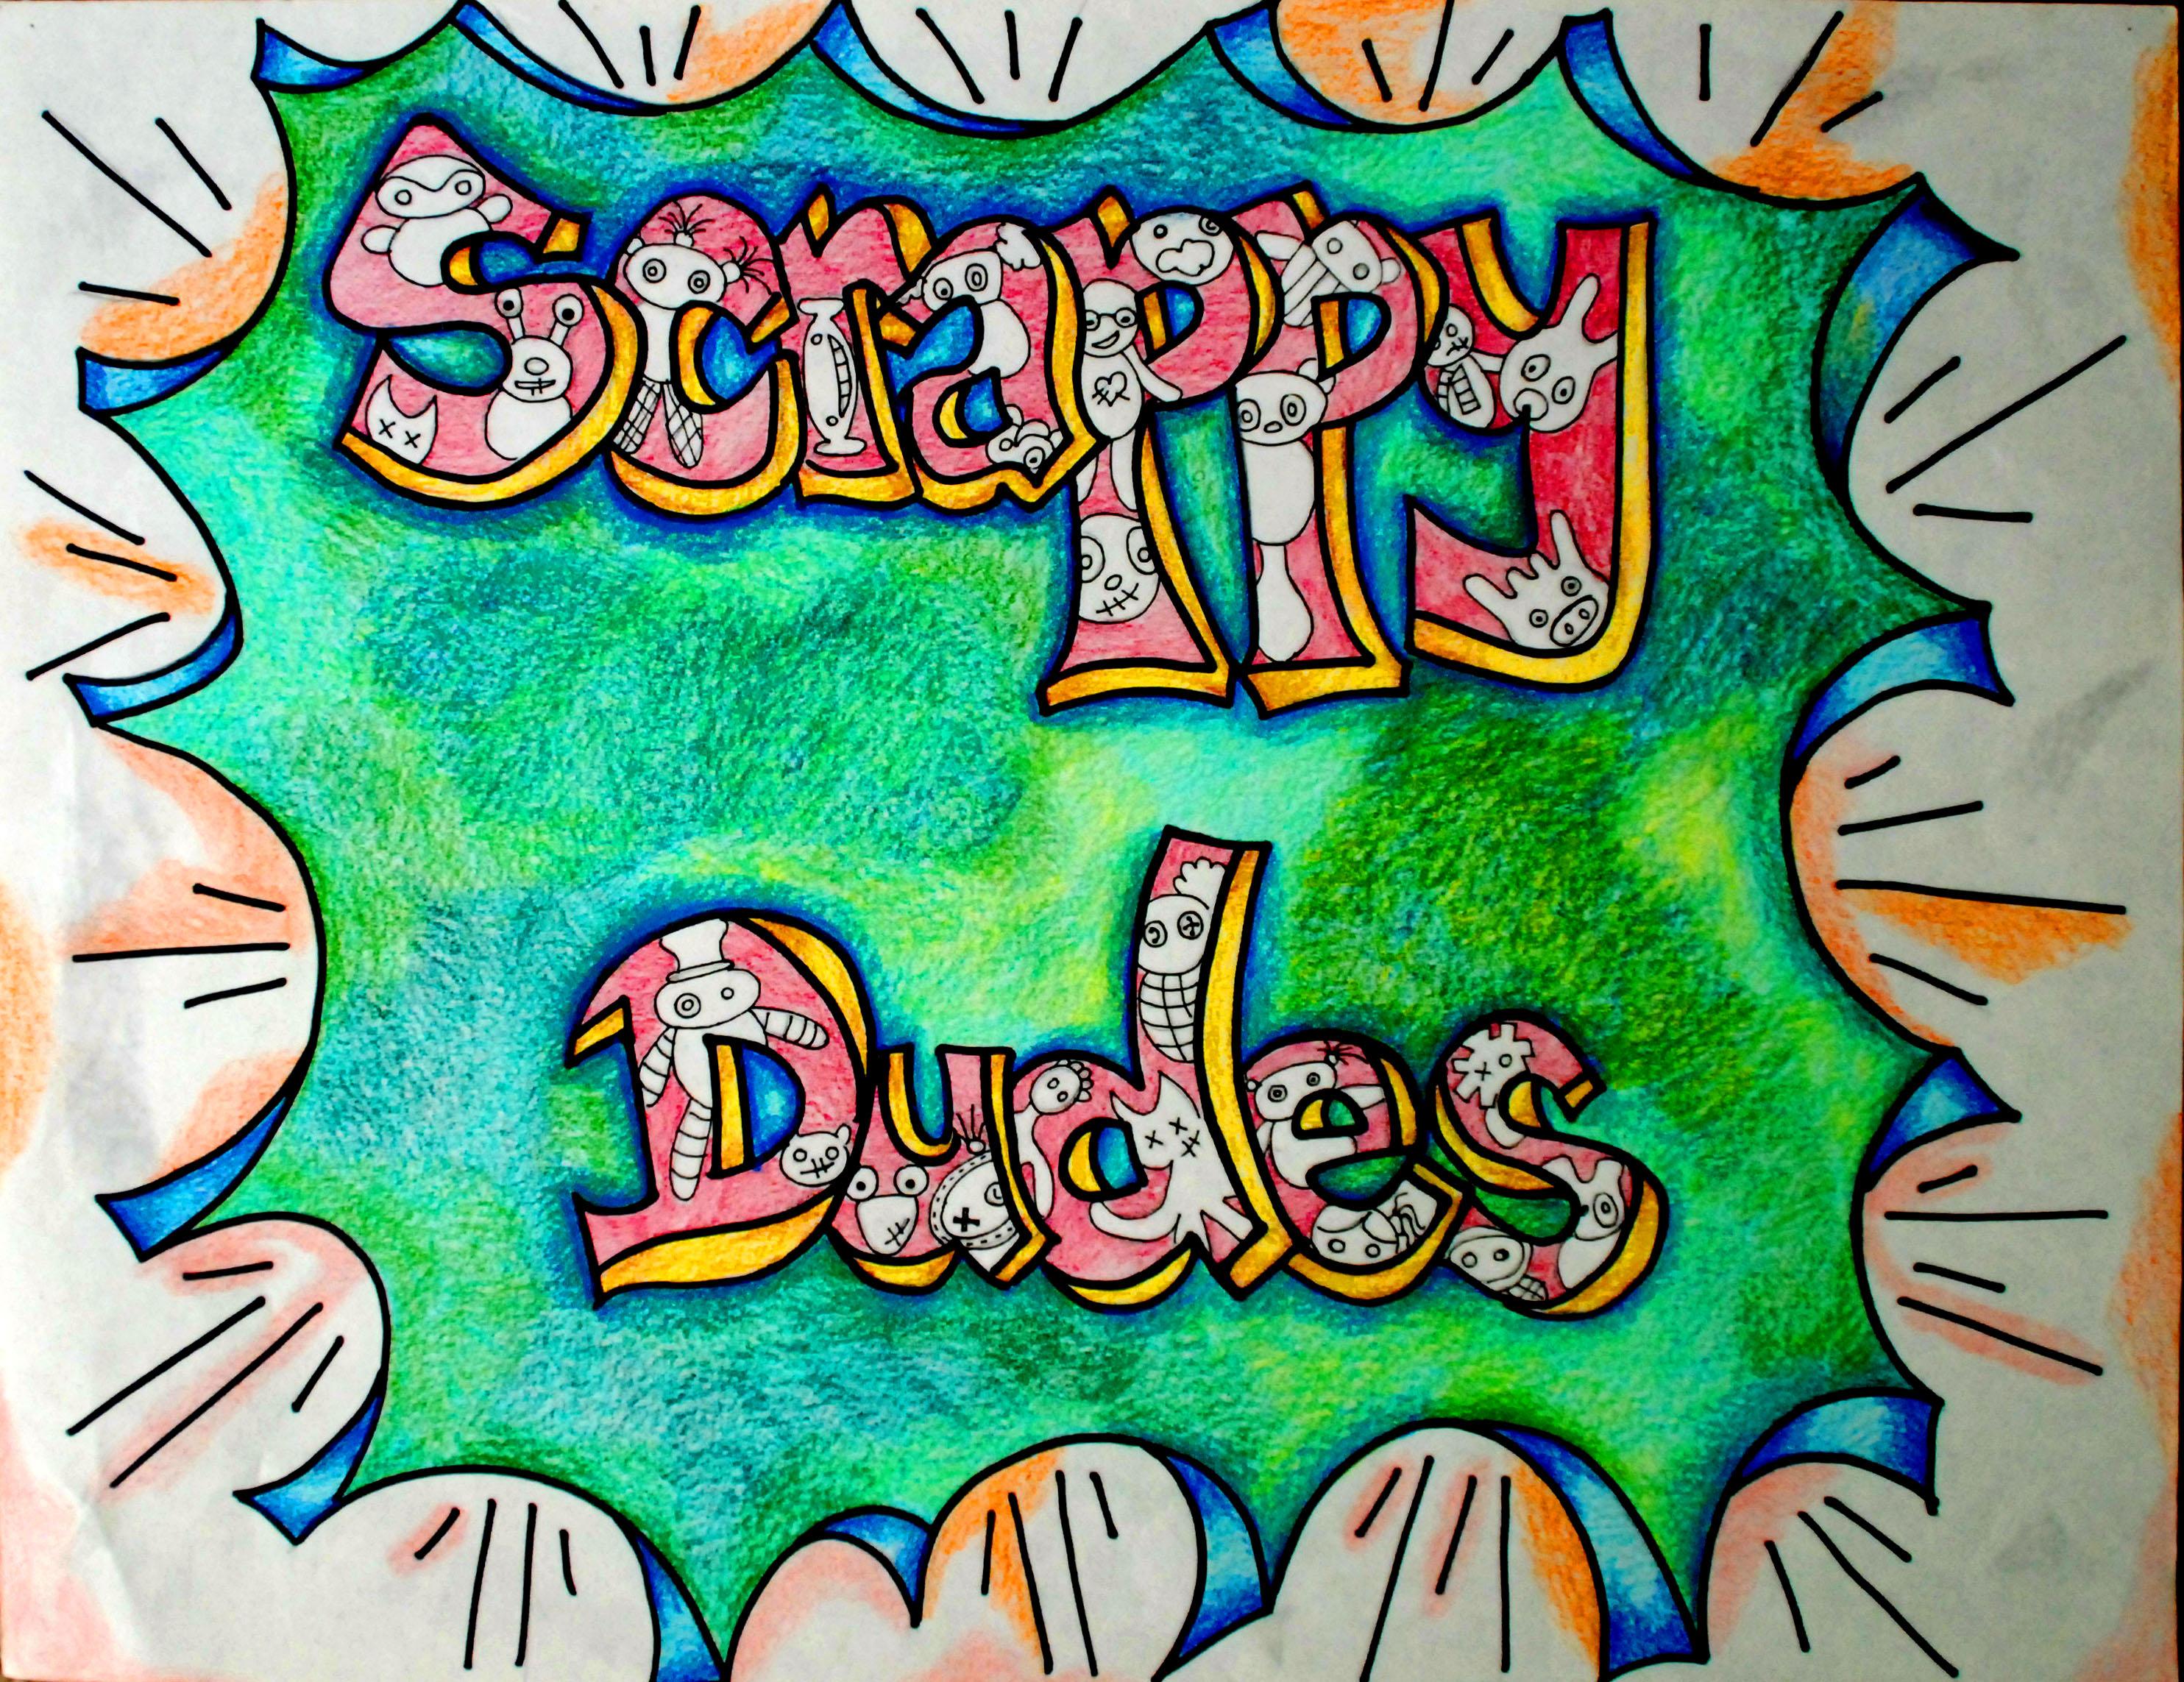 Scrappy Dudes Name and Origin